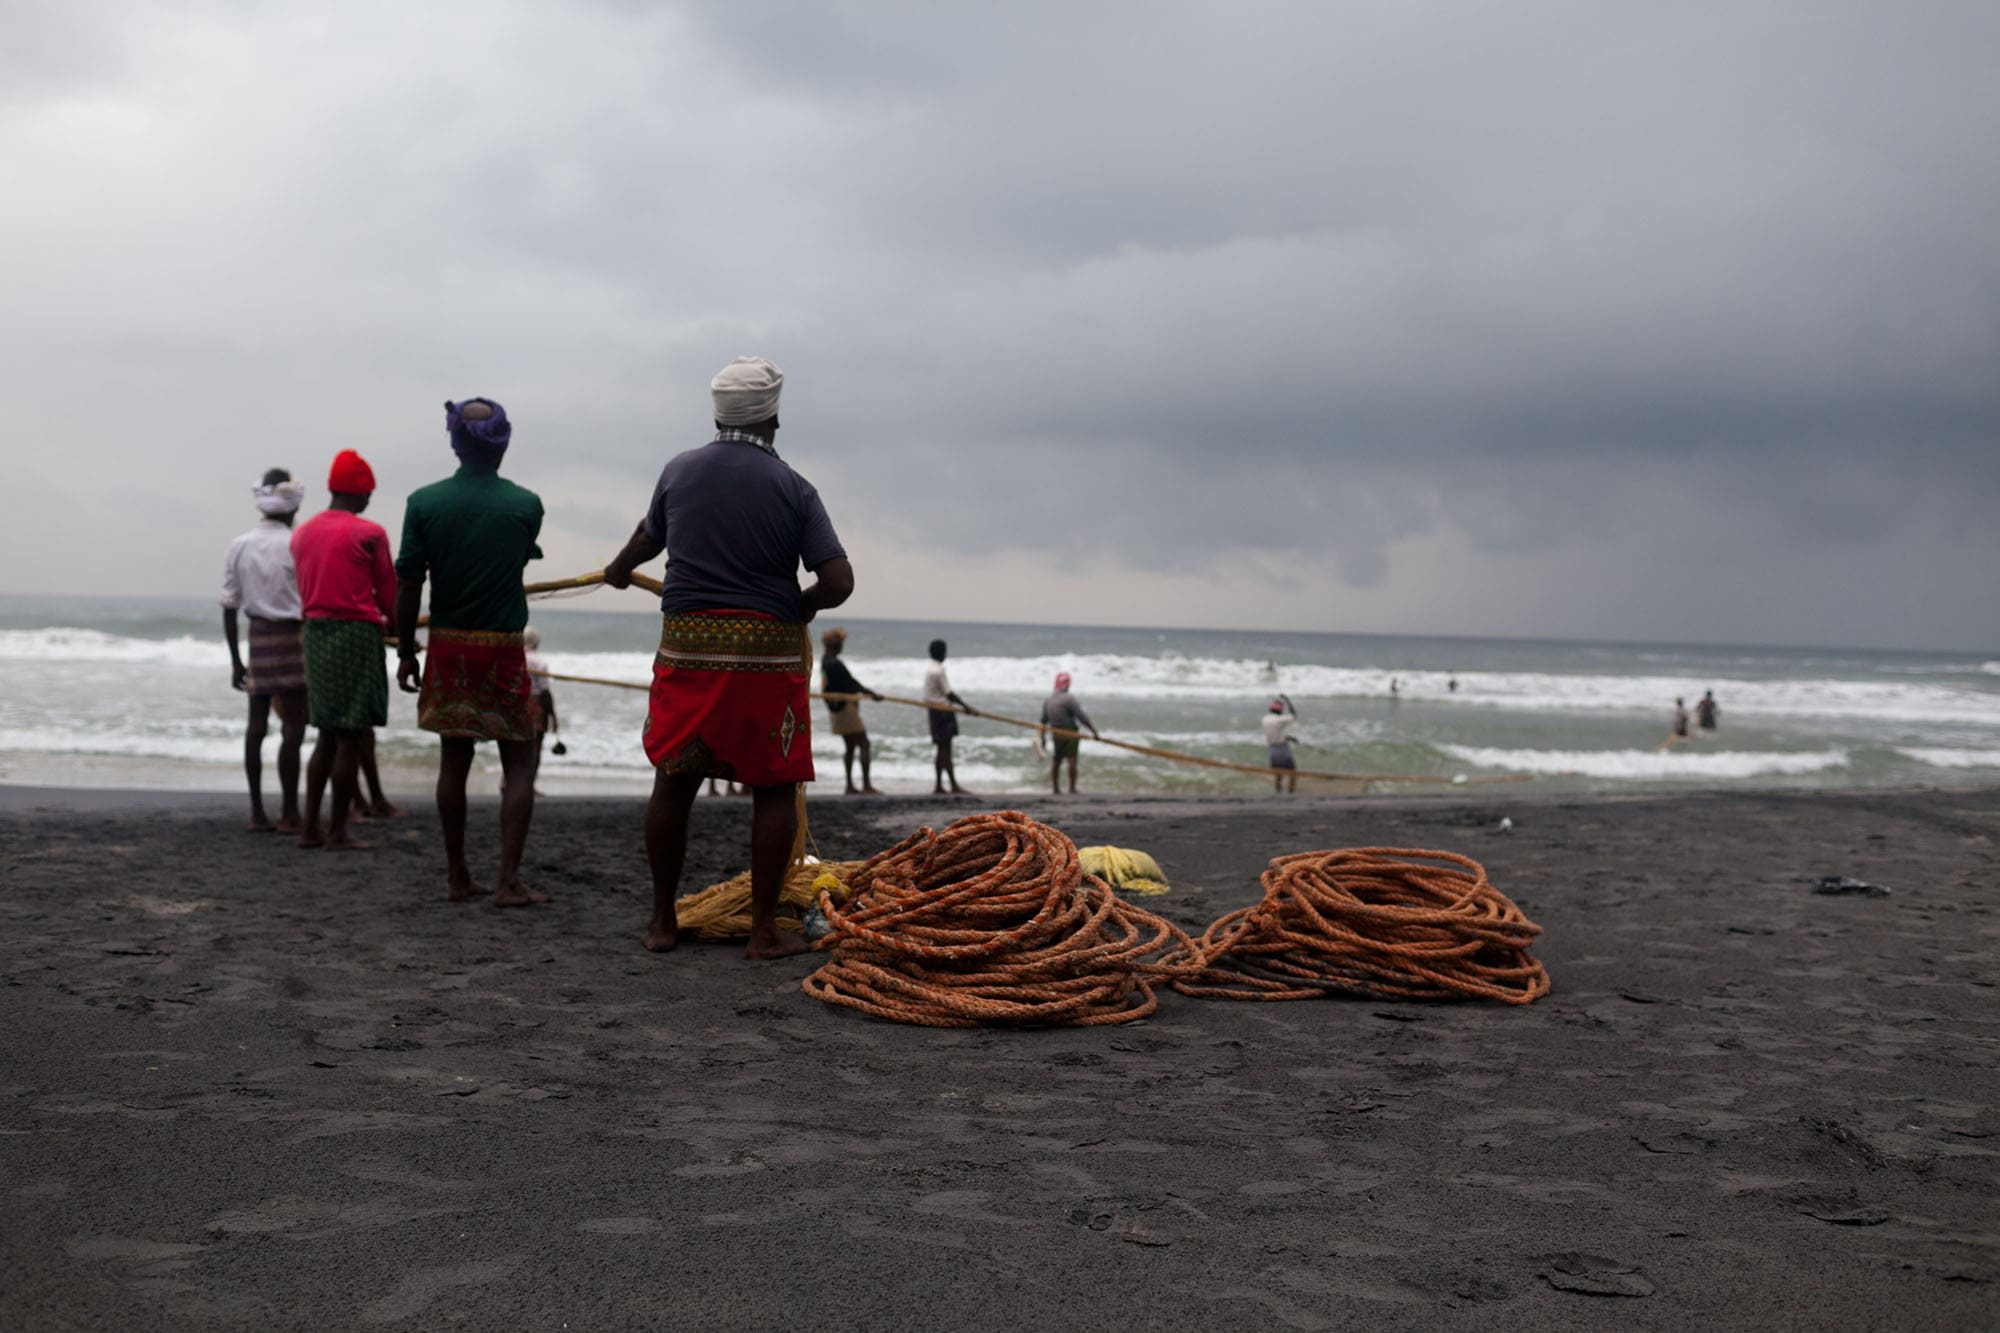 Fishermen on the beach in Kovalam, India